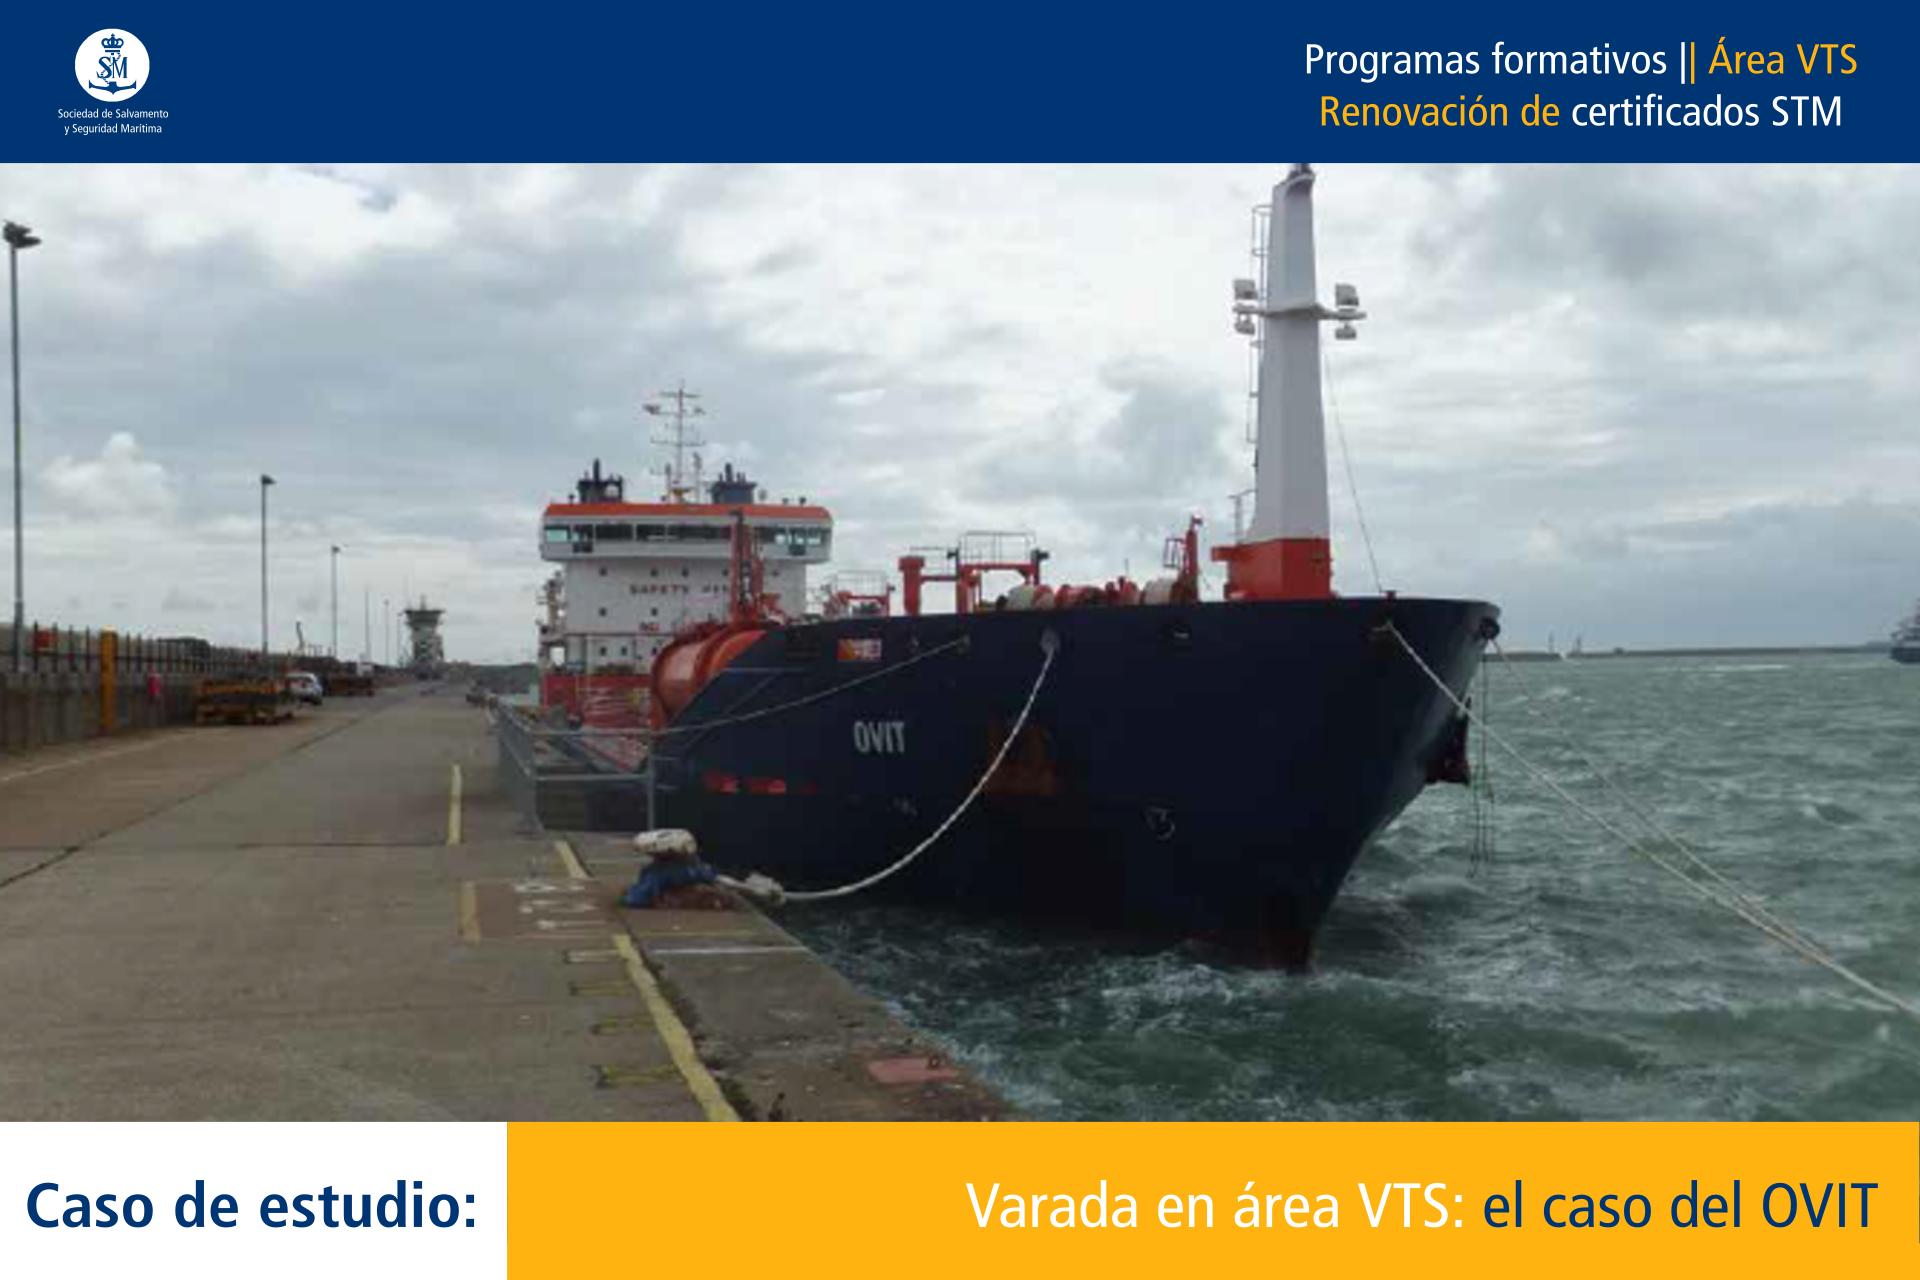 CE Varada en área VTS: Ovit